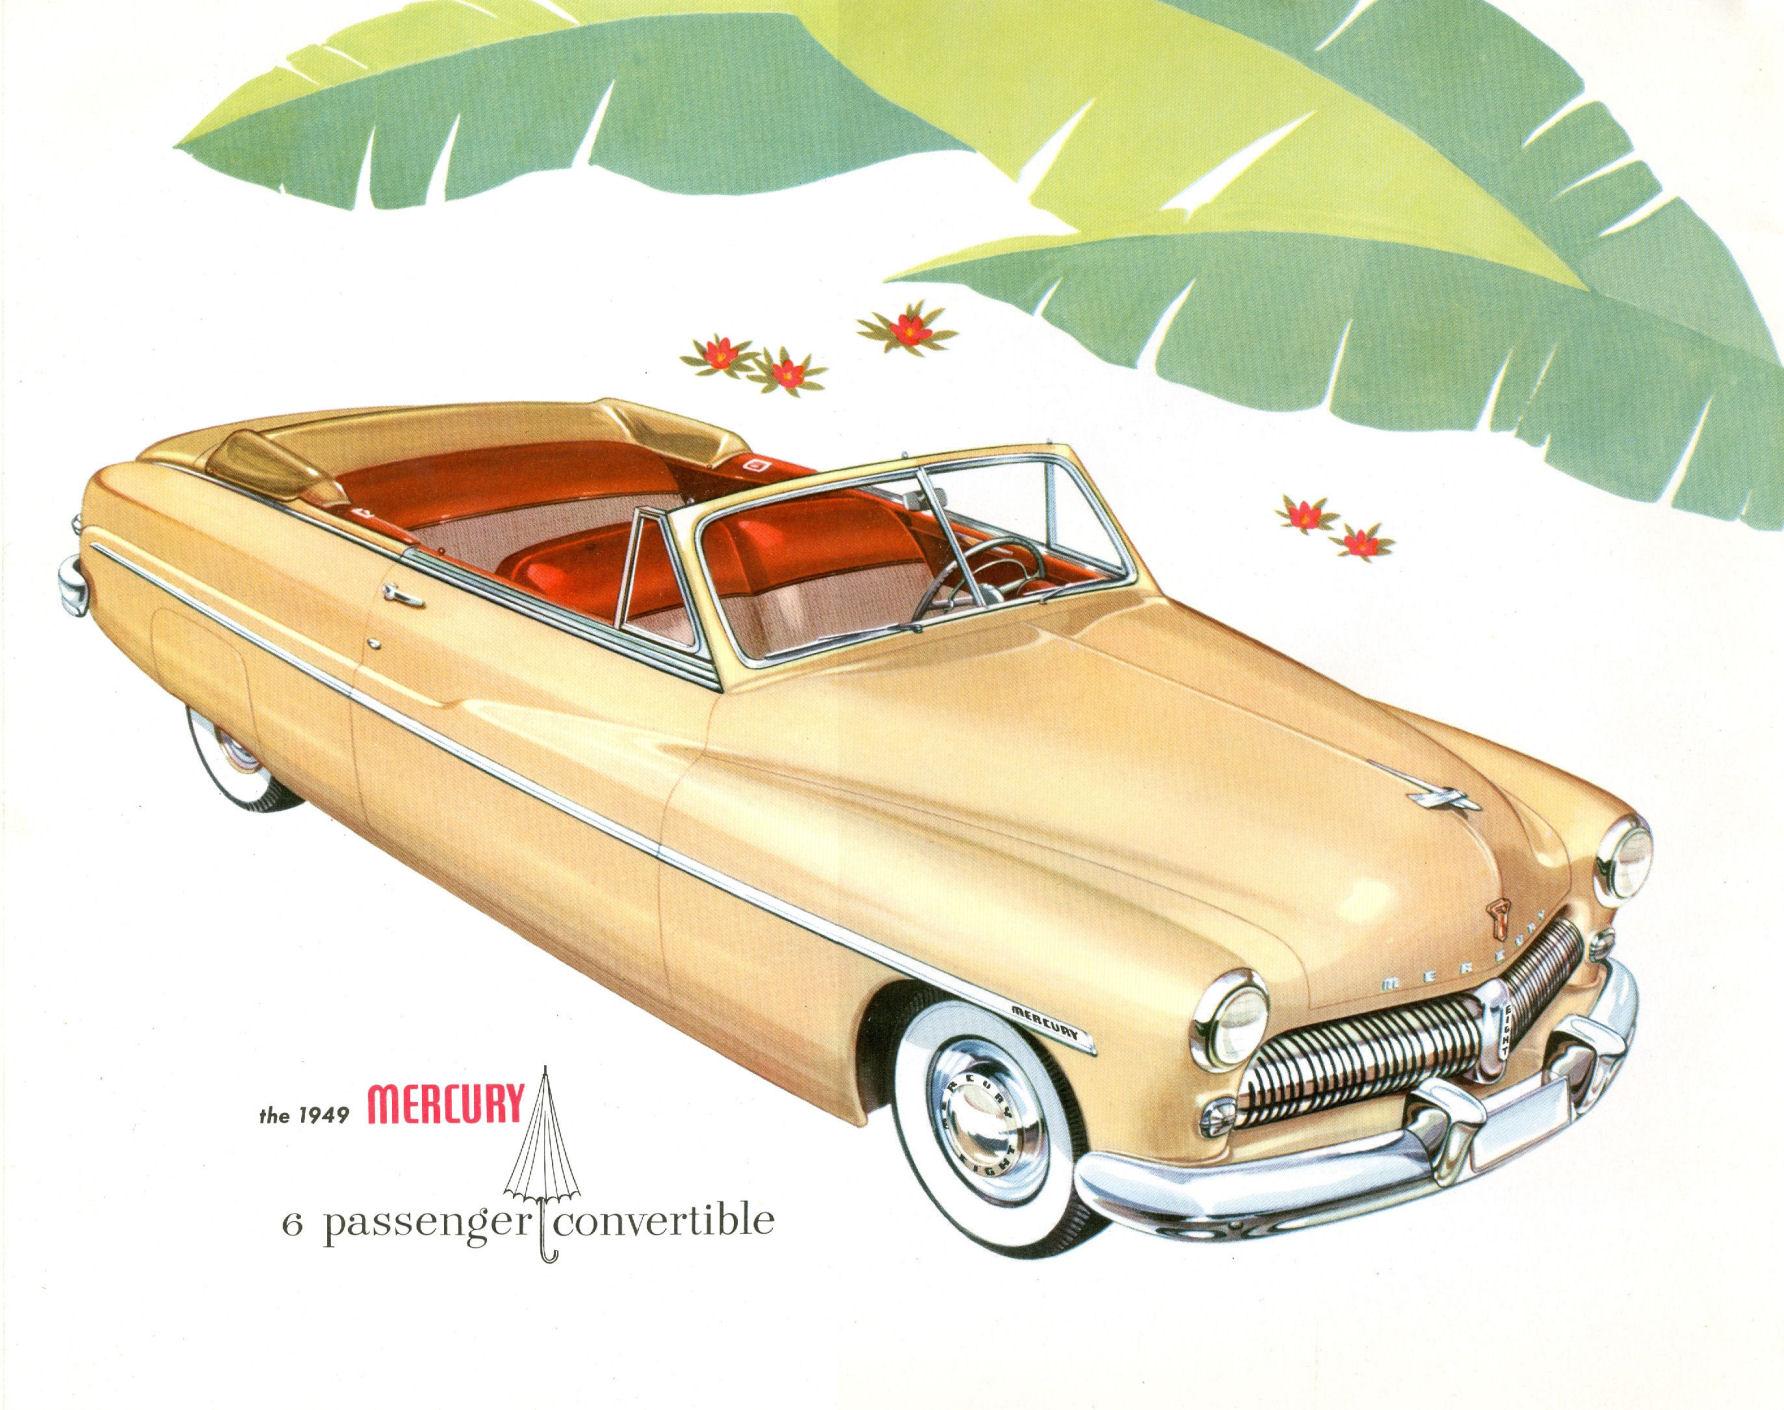 Old Car Dealers >> Directory Index: Mercury/1949_Mercury/1949 Mercury Brochure